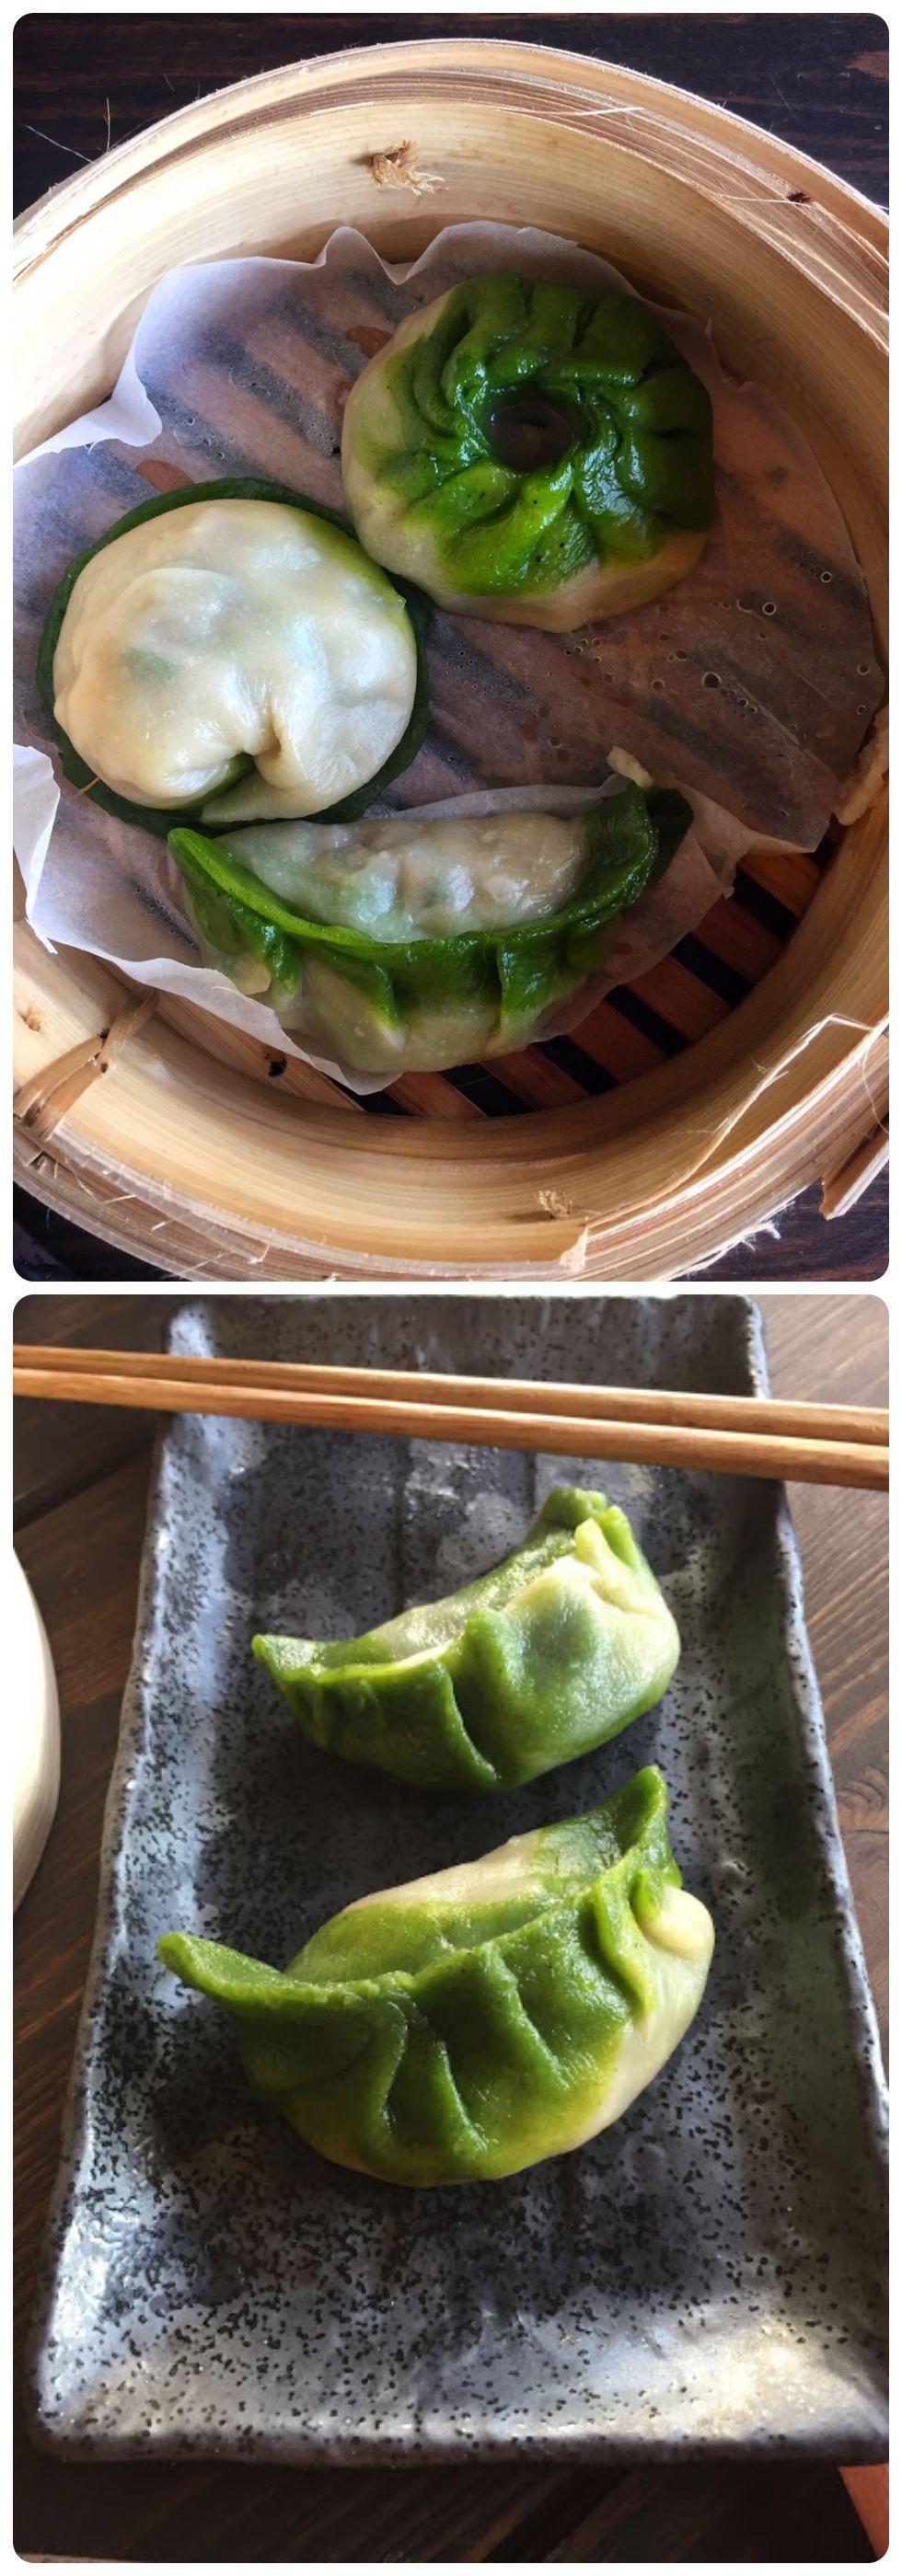 Green & White Dumplings - Chard Dumplings